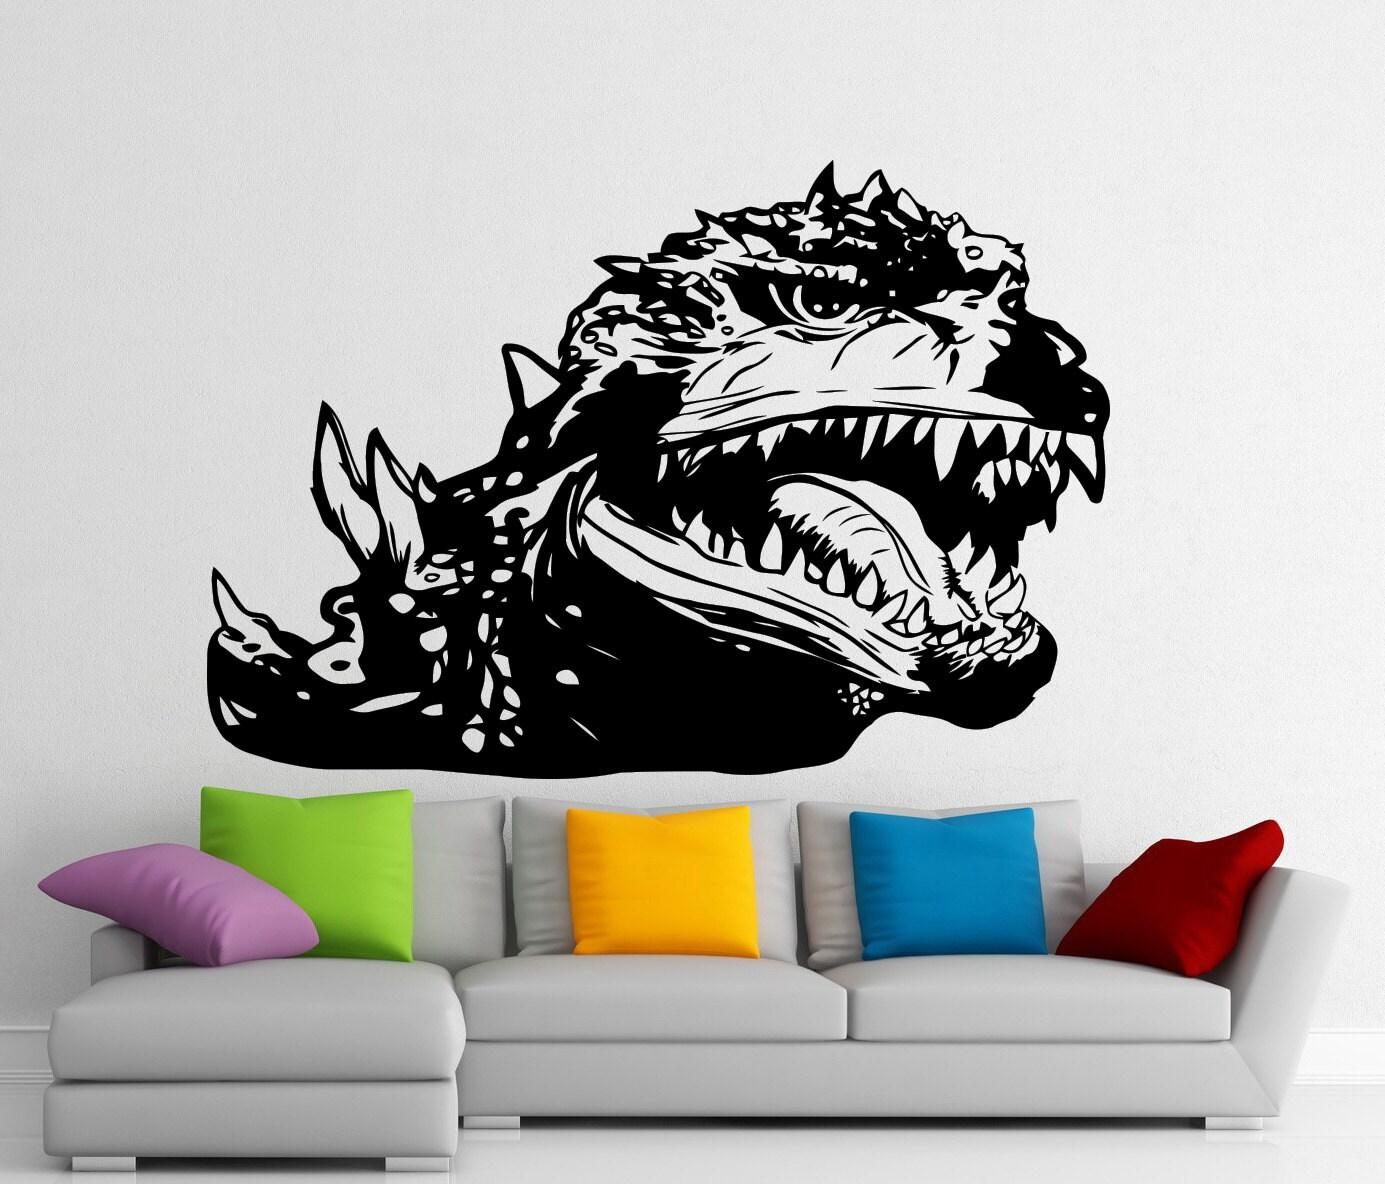 godzilla sticker monster wall vinyl decal home kids room zoom